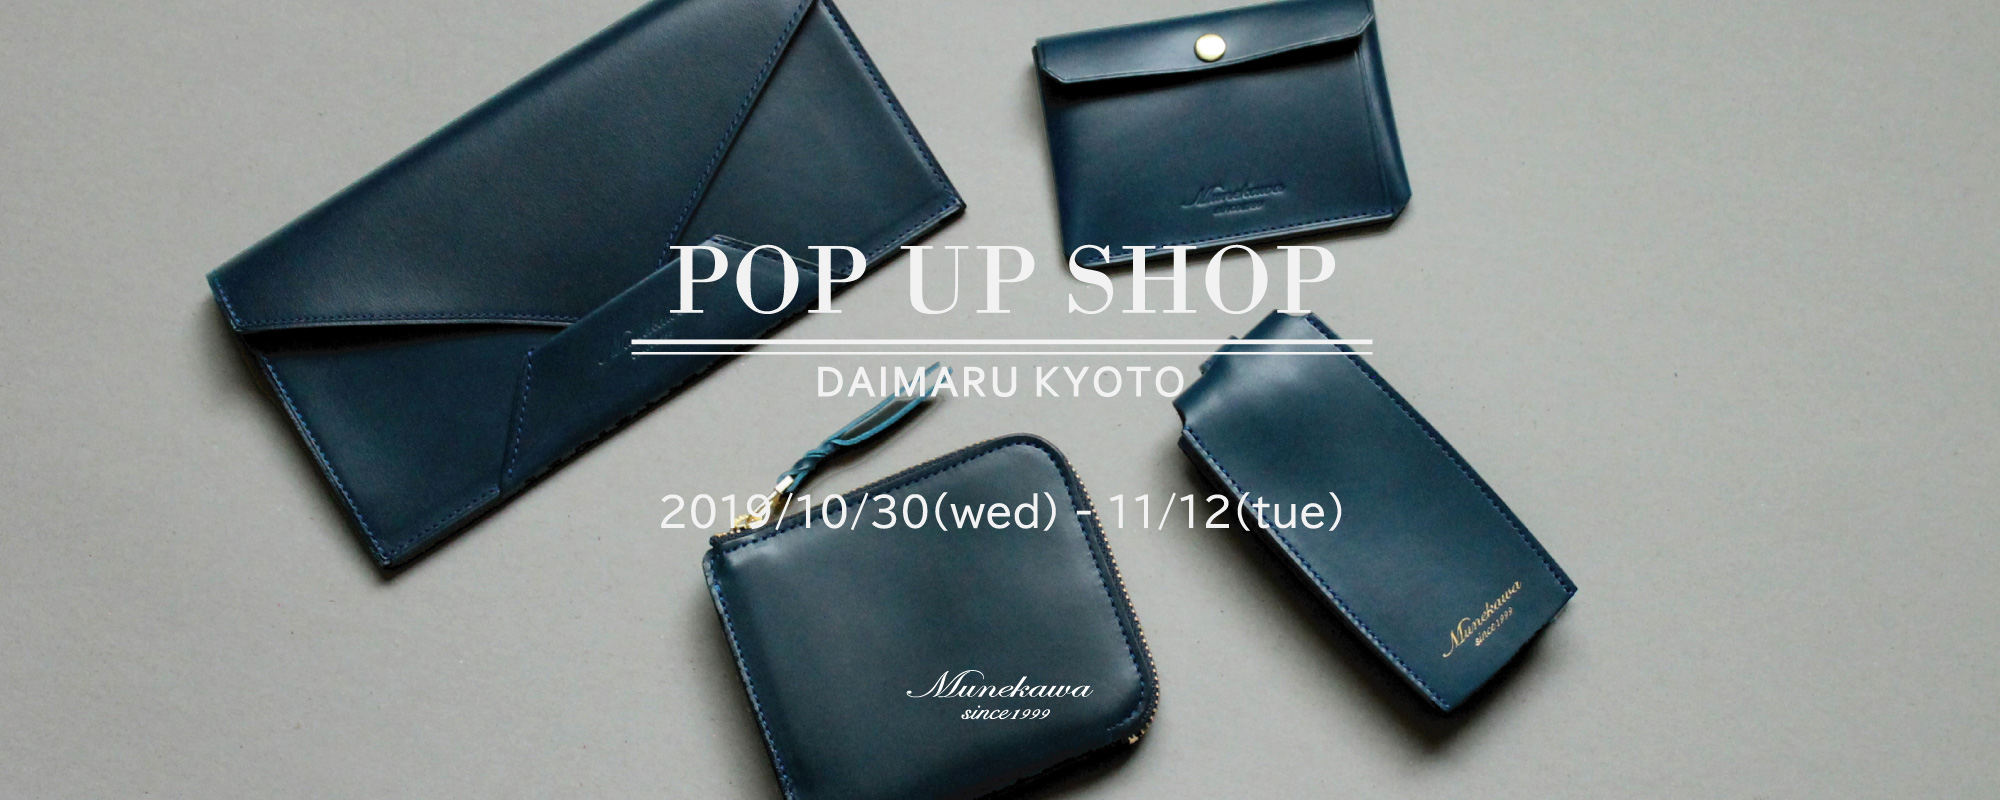 Munekawa POP UP SHOP@大丸京都店